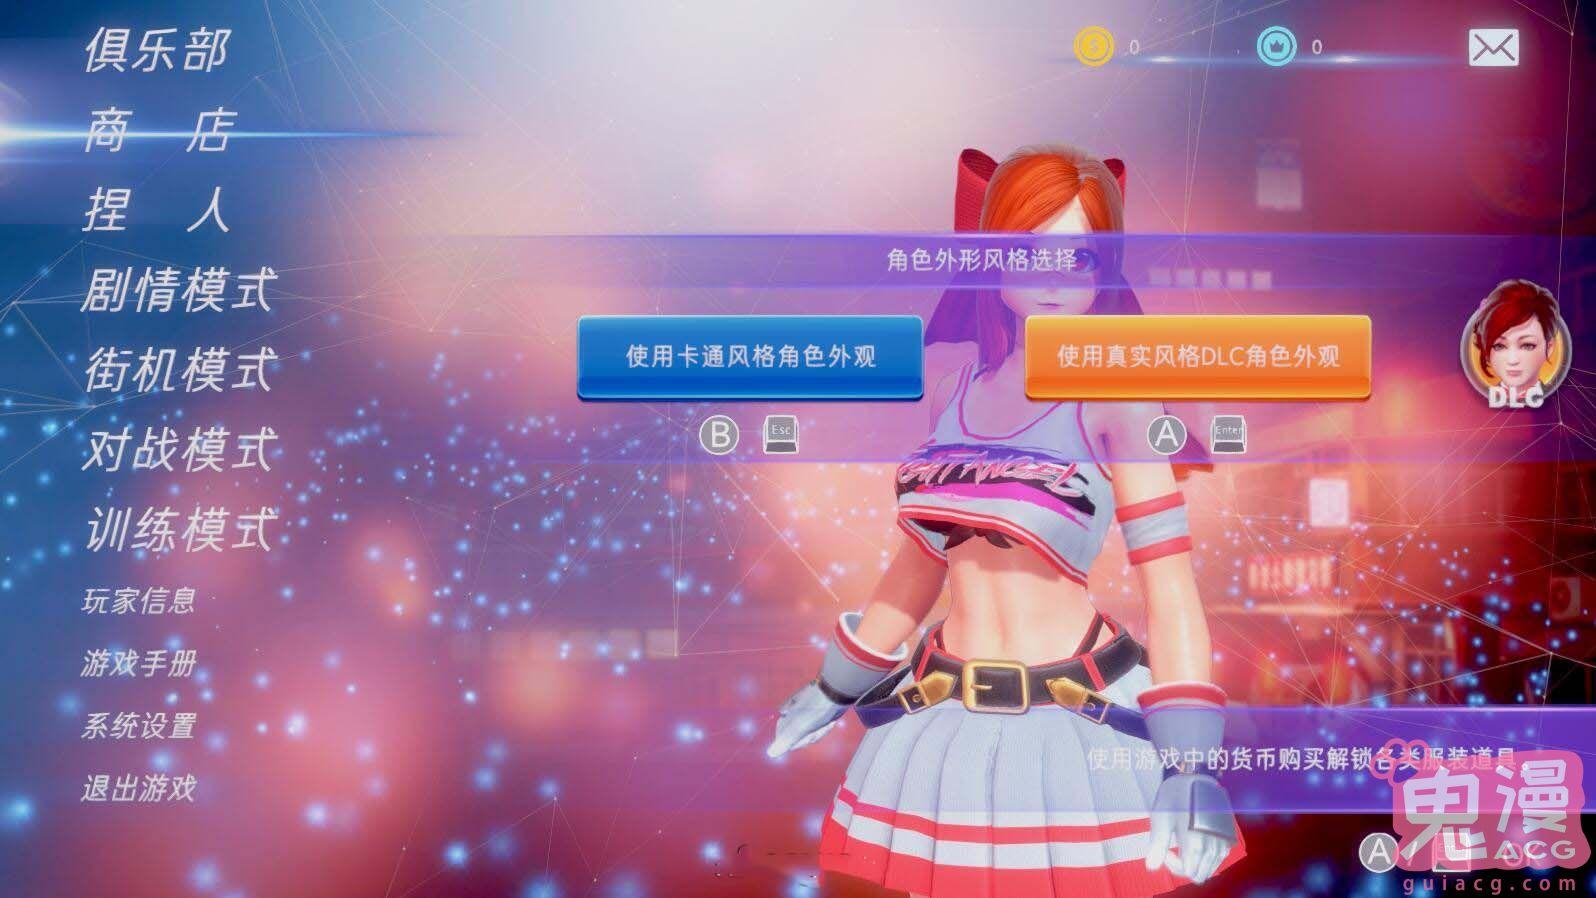 【ACT/格斗/捏脸/爆衣】Fight Angel 格斗天使SE 官方中文版!社保补丁+整合DLC【1.3G解压4G】 电脑游戏 第11张